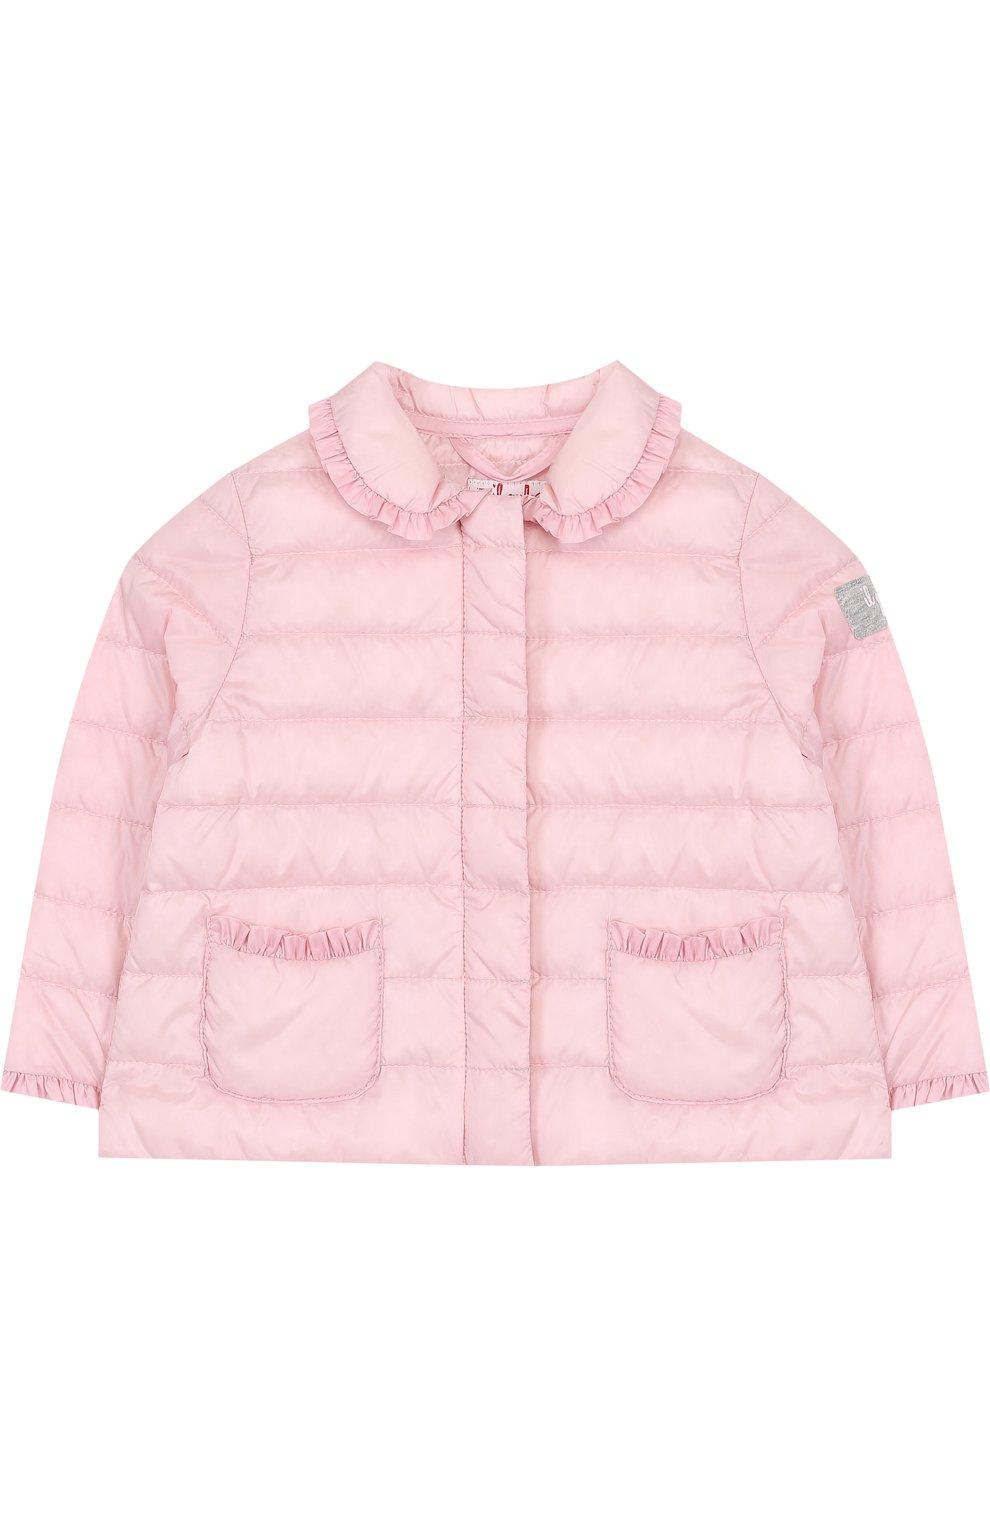 Детского пуховая куртка с оборками IL GUFO розового цвета, арт. P18GR108N0035/2A-4A   Фото 1